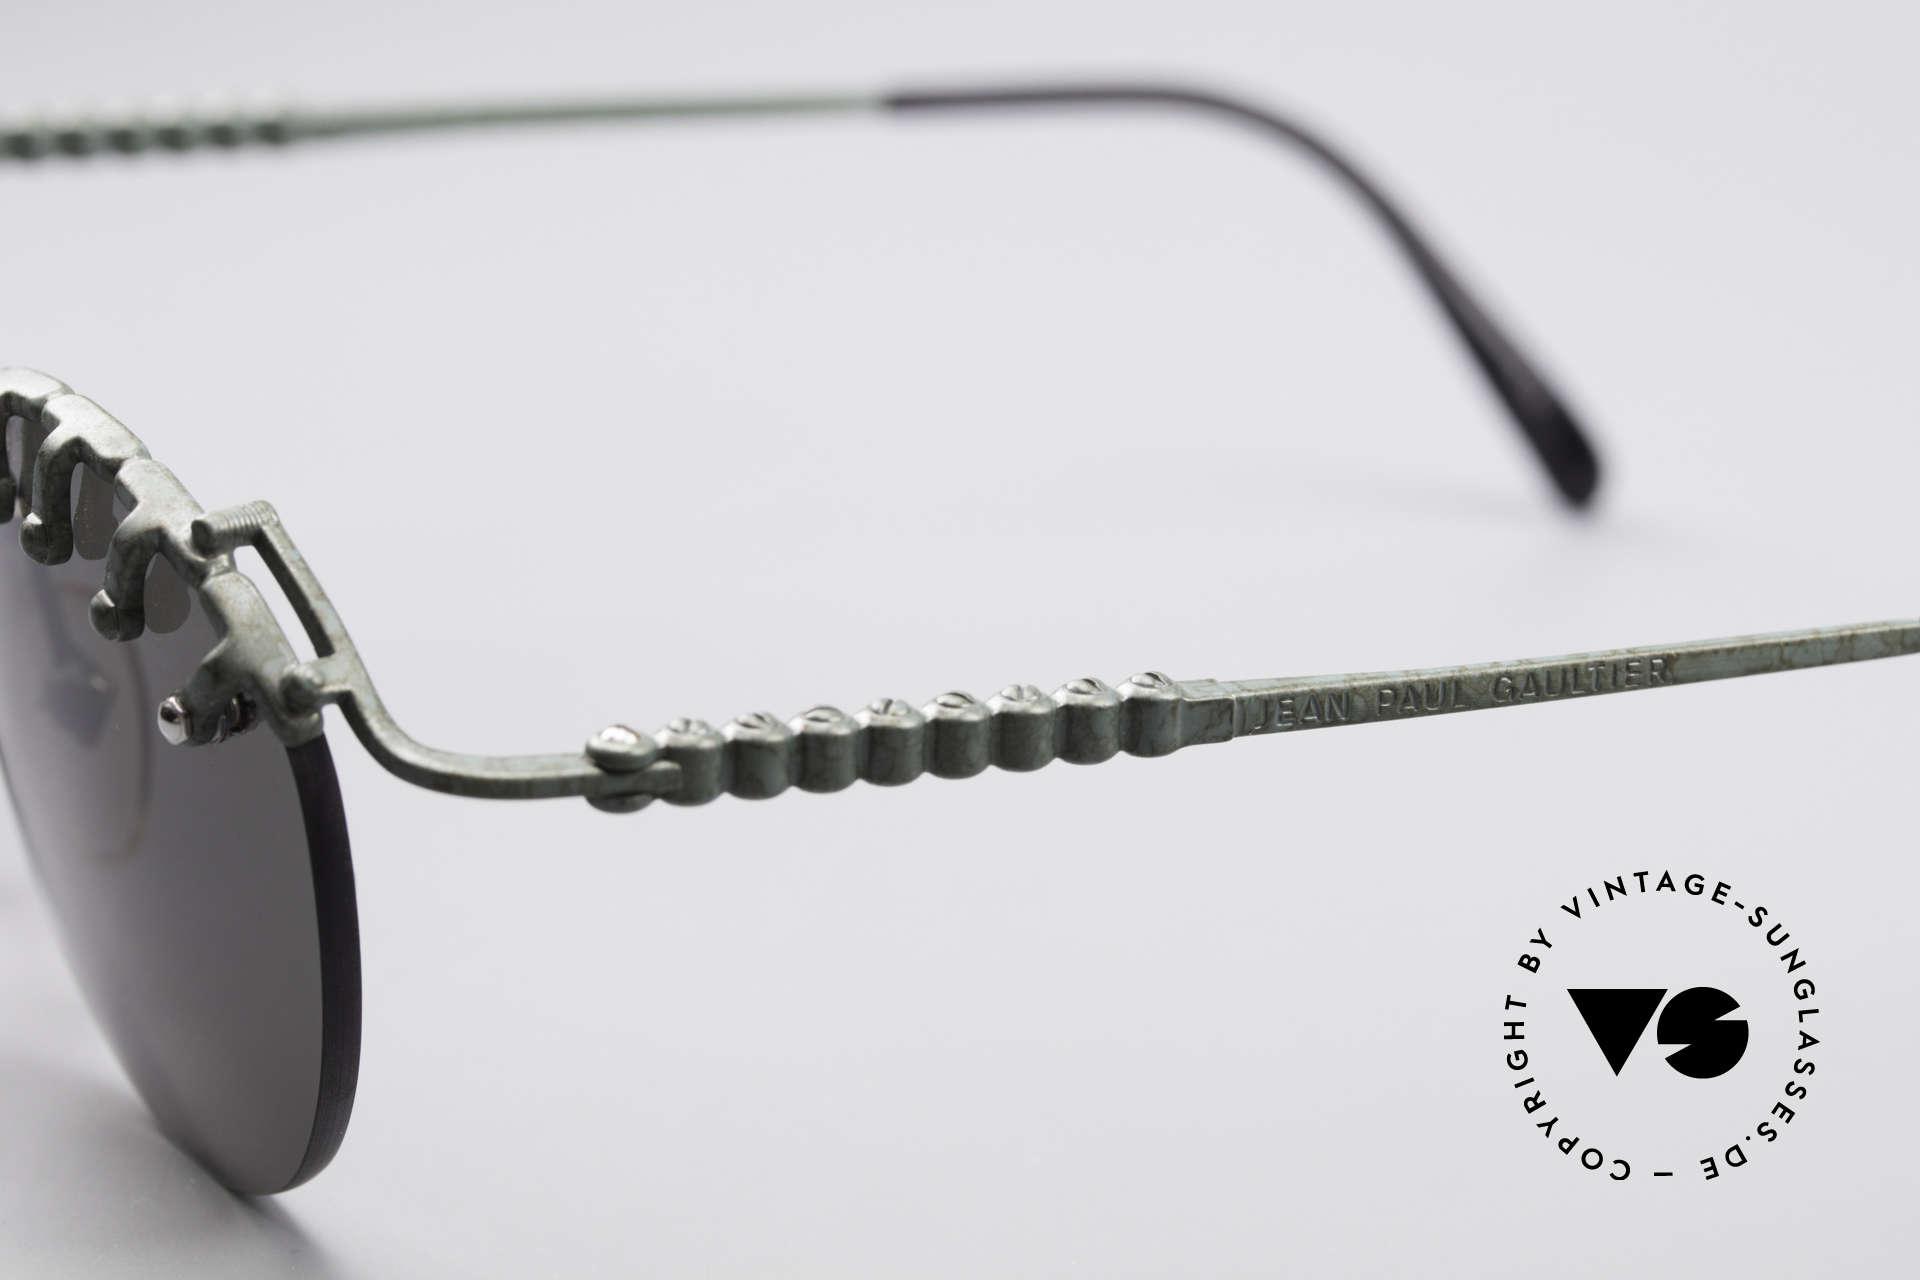 Jean Paul Gaultier 56-5103 Rihanna Vintage Glasses, unworn rarity (like all our vintage J.P.G. sunglasses), Made for Women